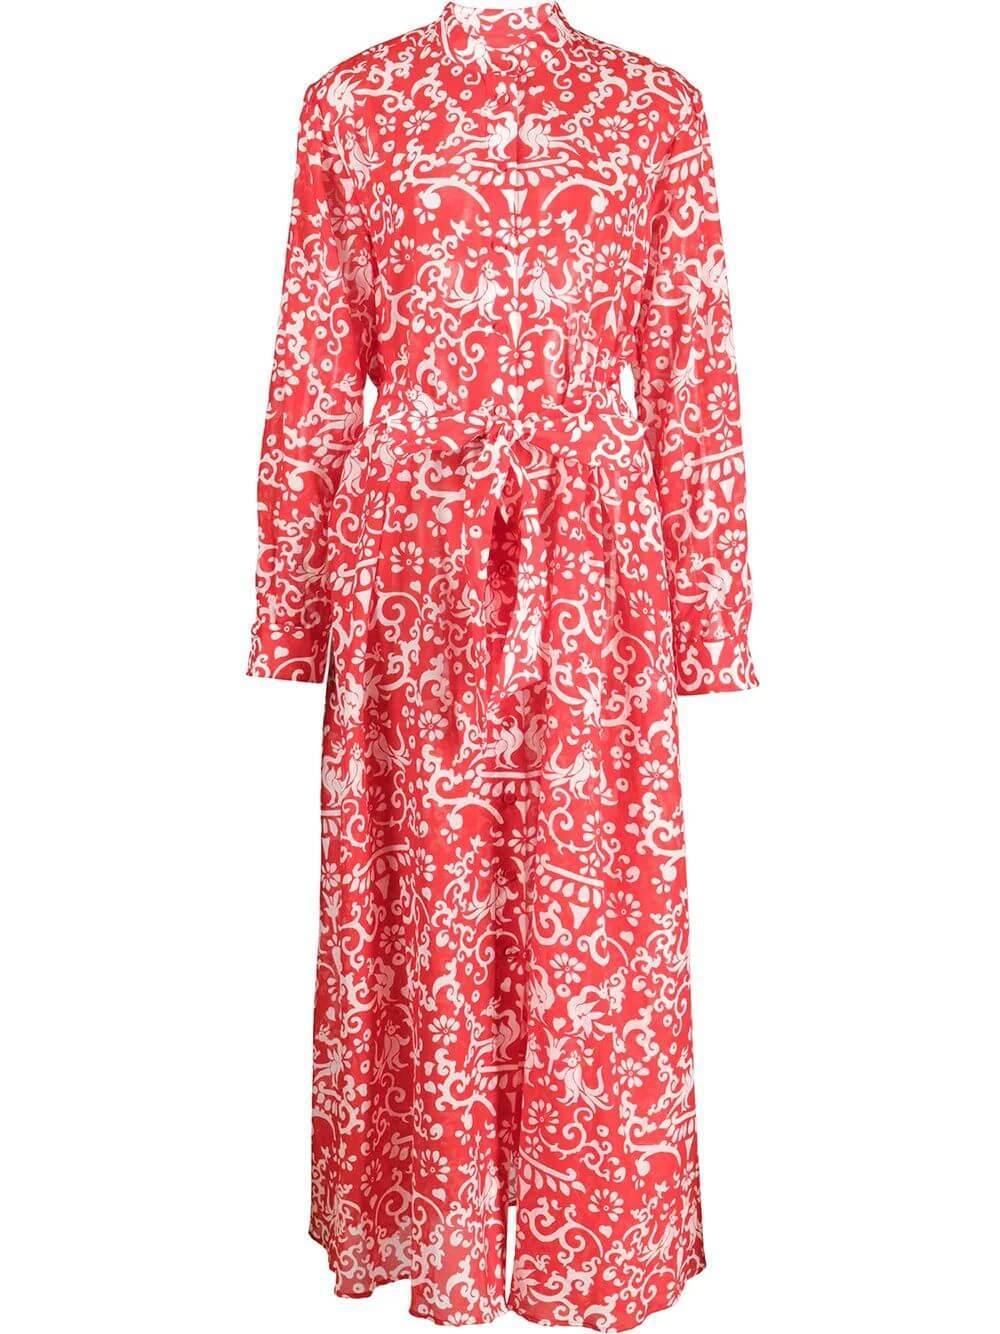 Inez Printed Midi Dress Item # 10416-S21